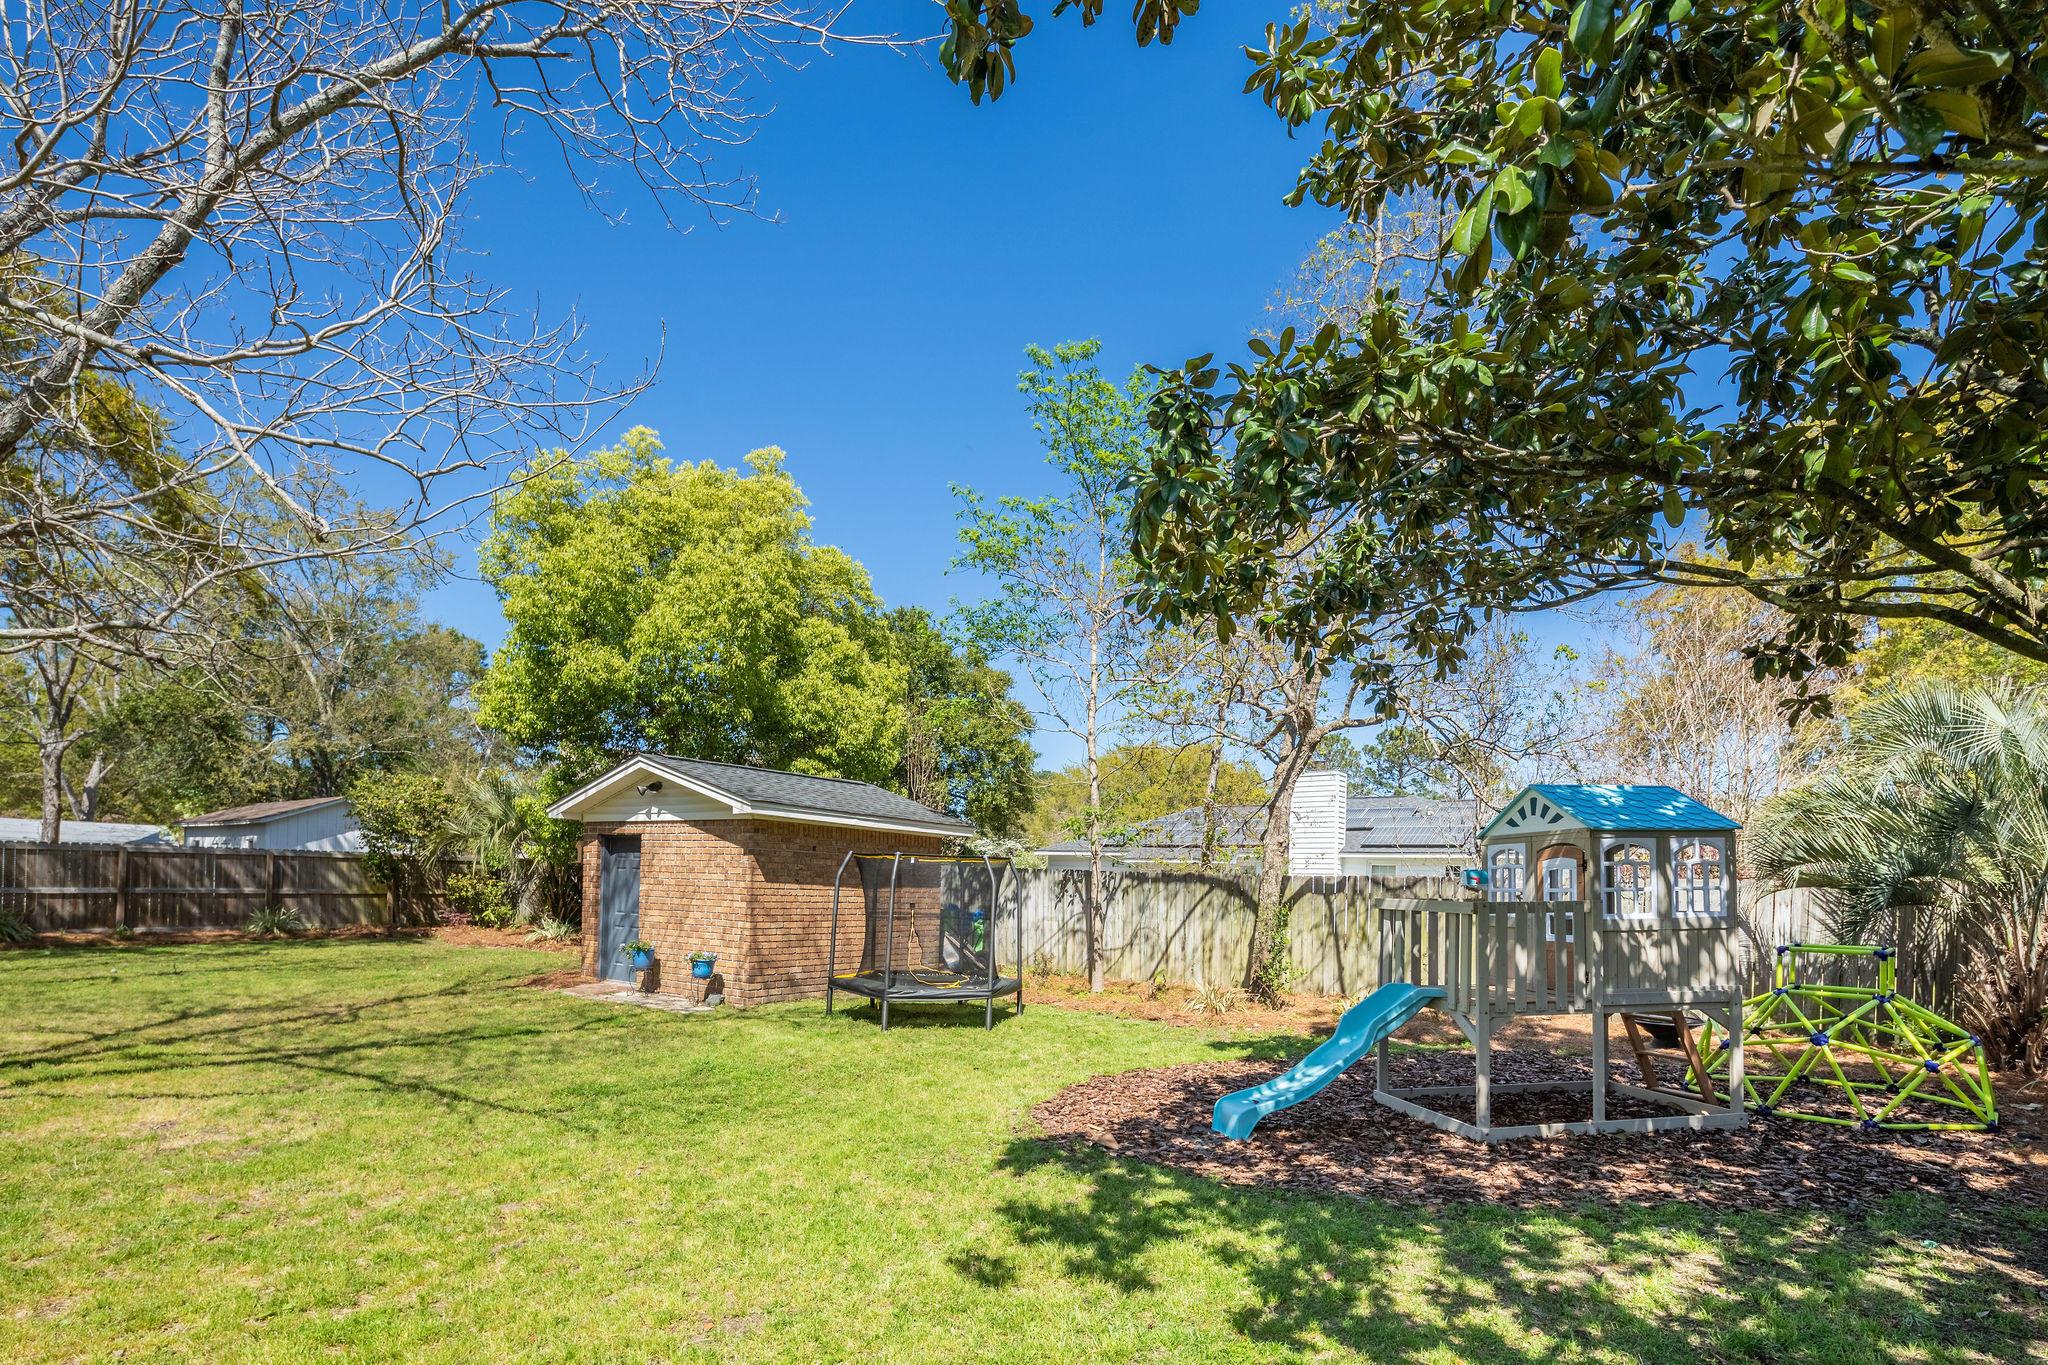 Cooper Estates Homes For Sale - 1058 Cottingham, Mount Pleasant, SC - 3